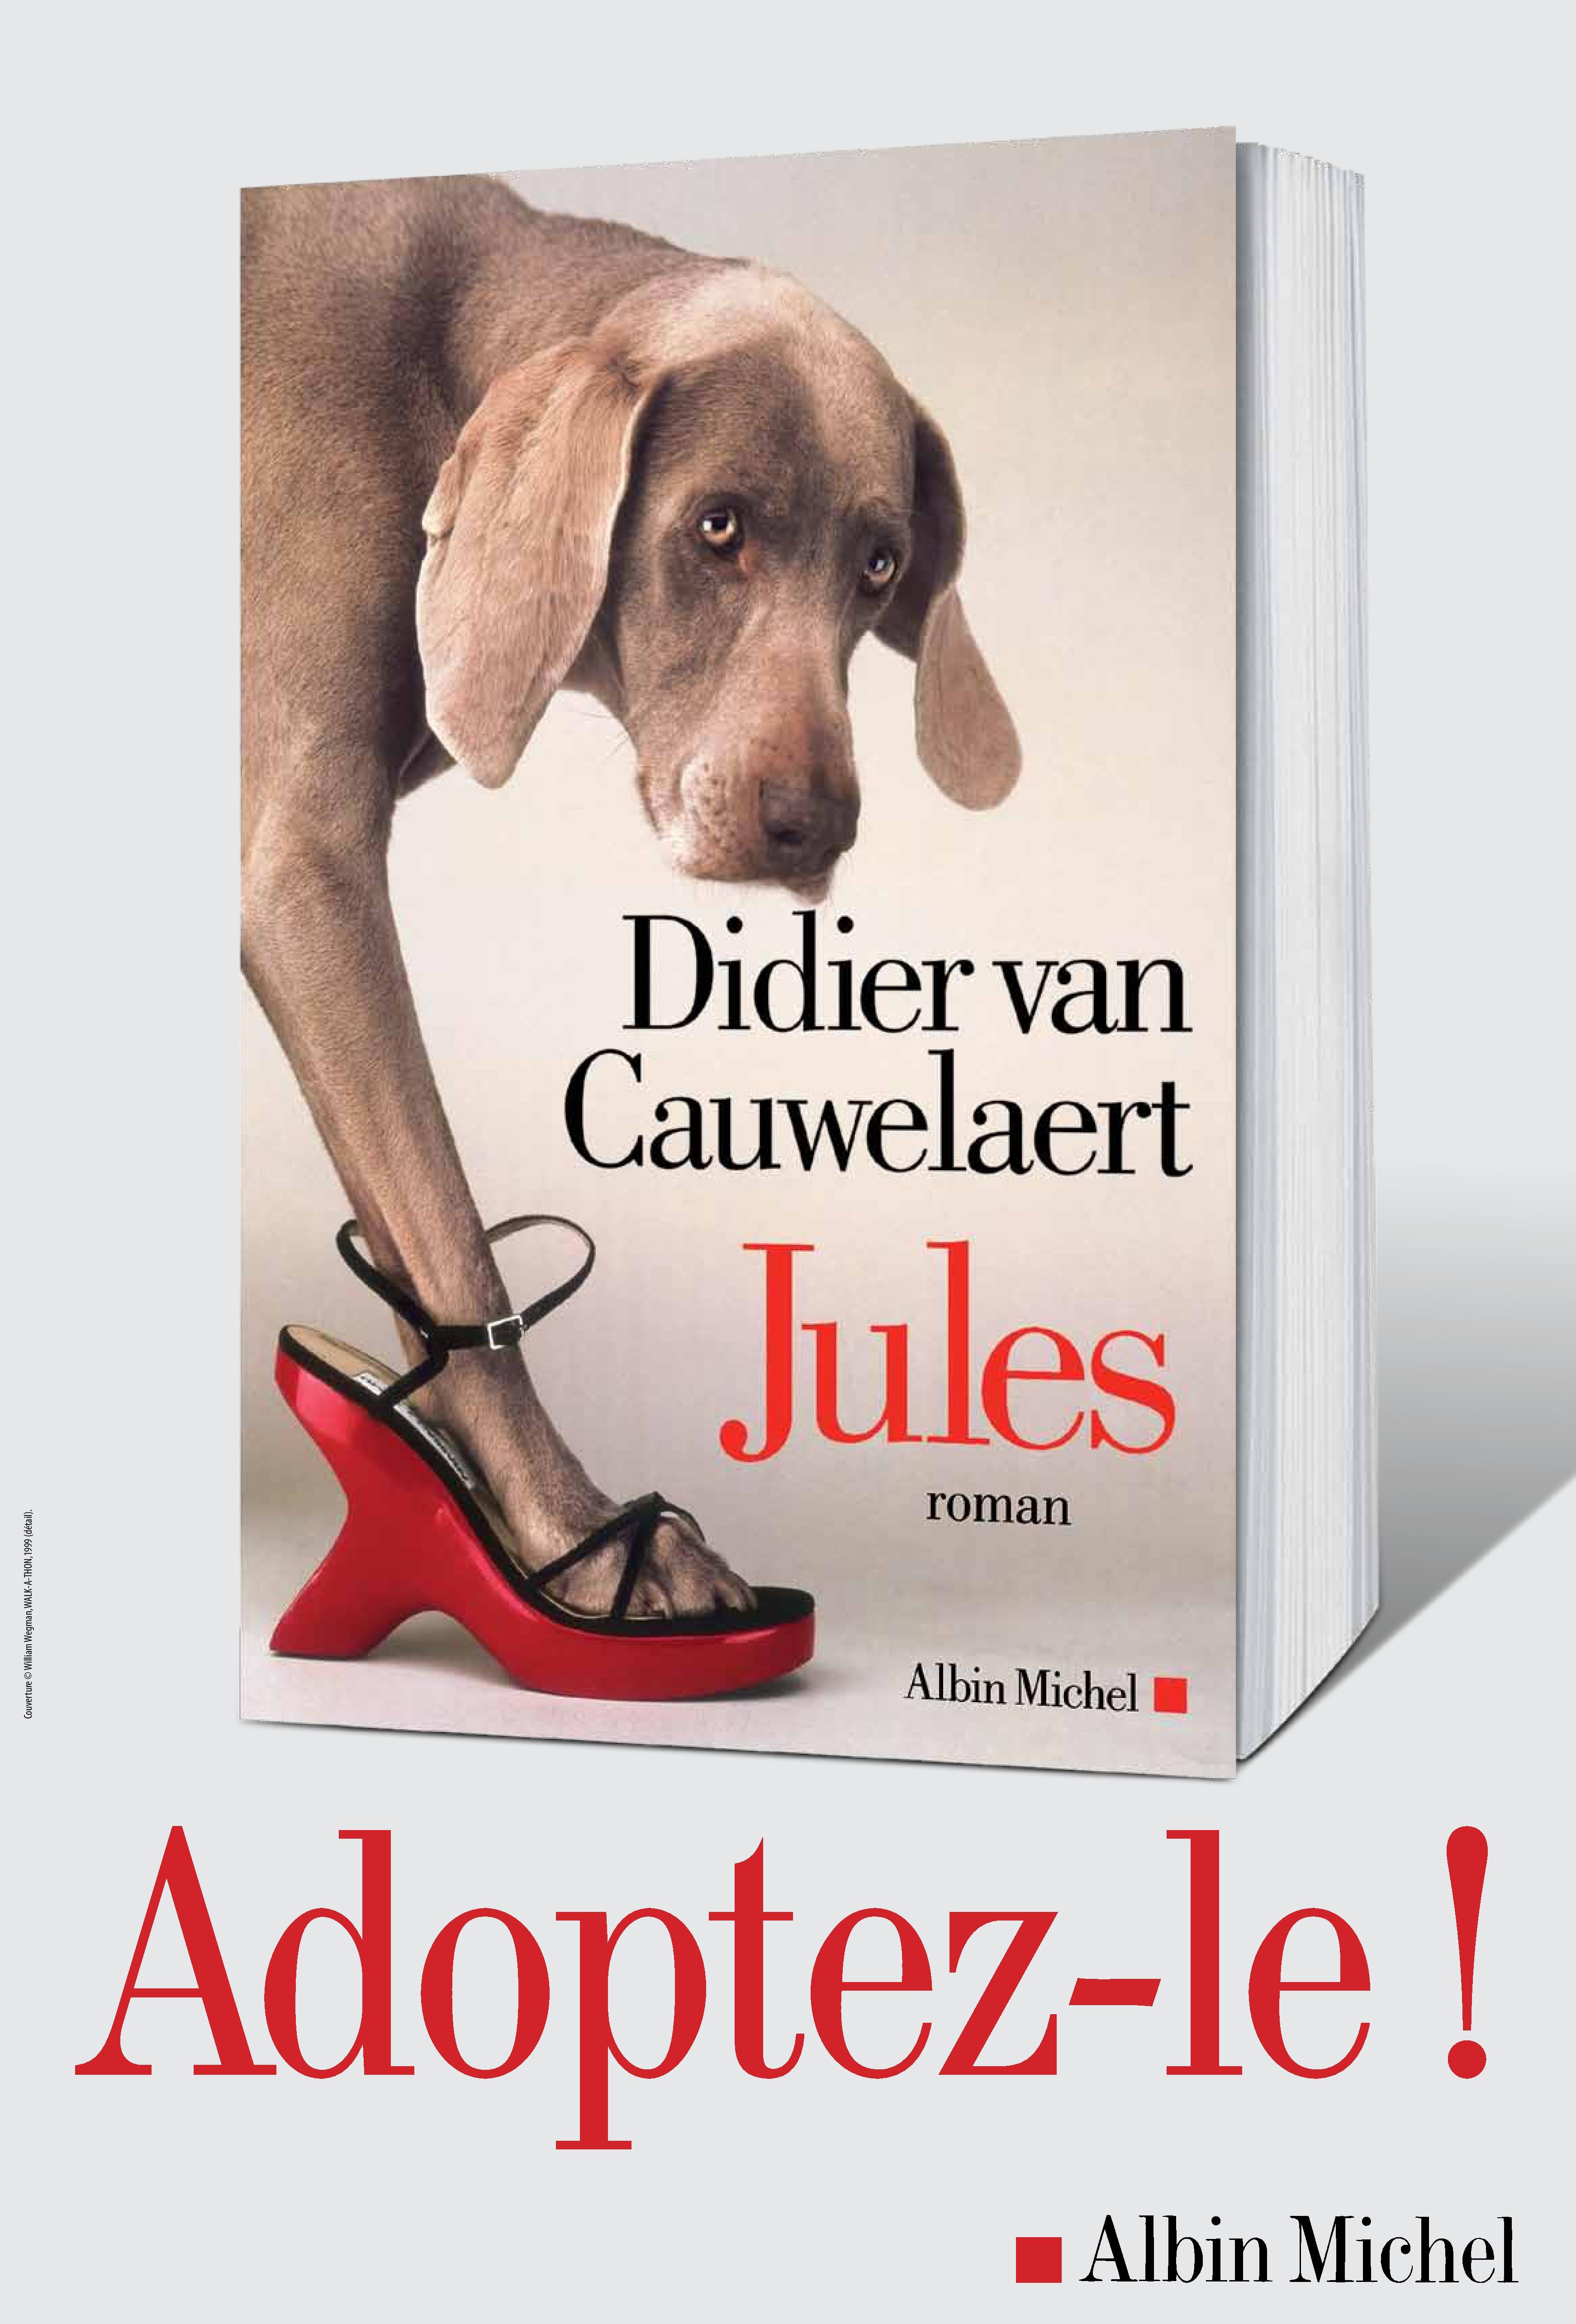 Cauwelaert